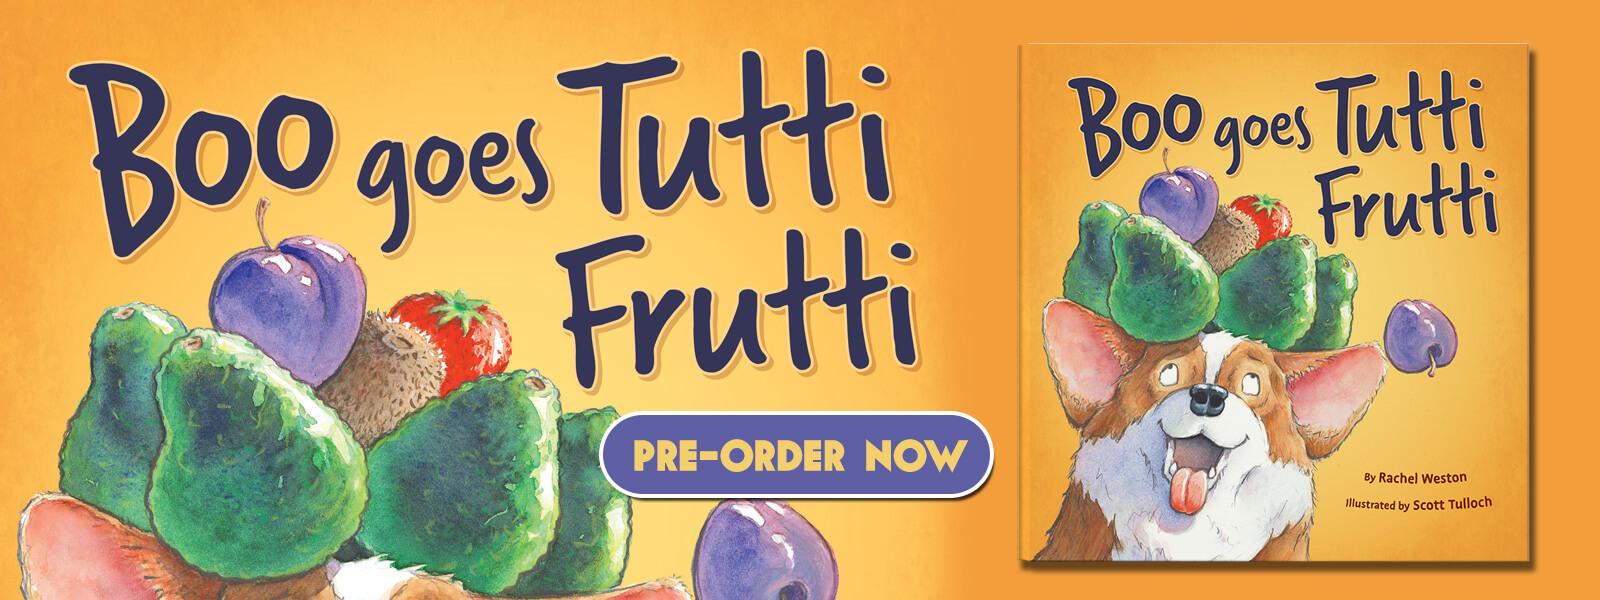 boo goes tutti frutti childrens fiction book rachel weston